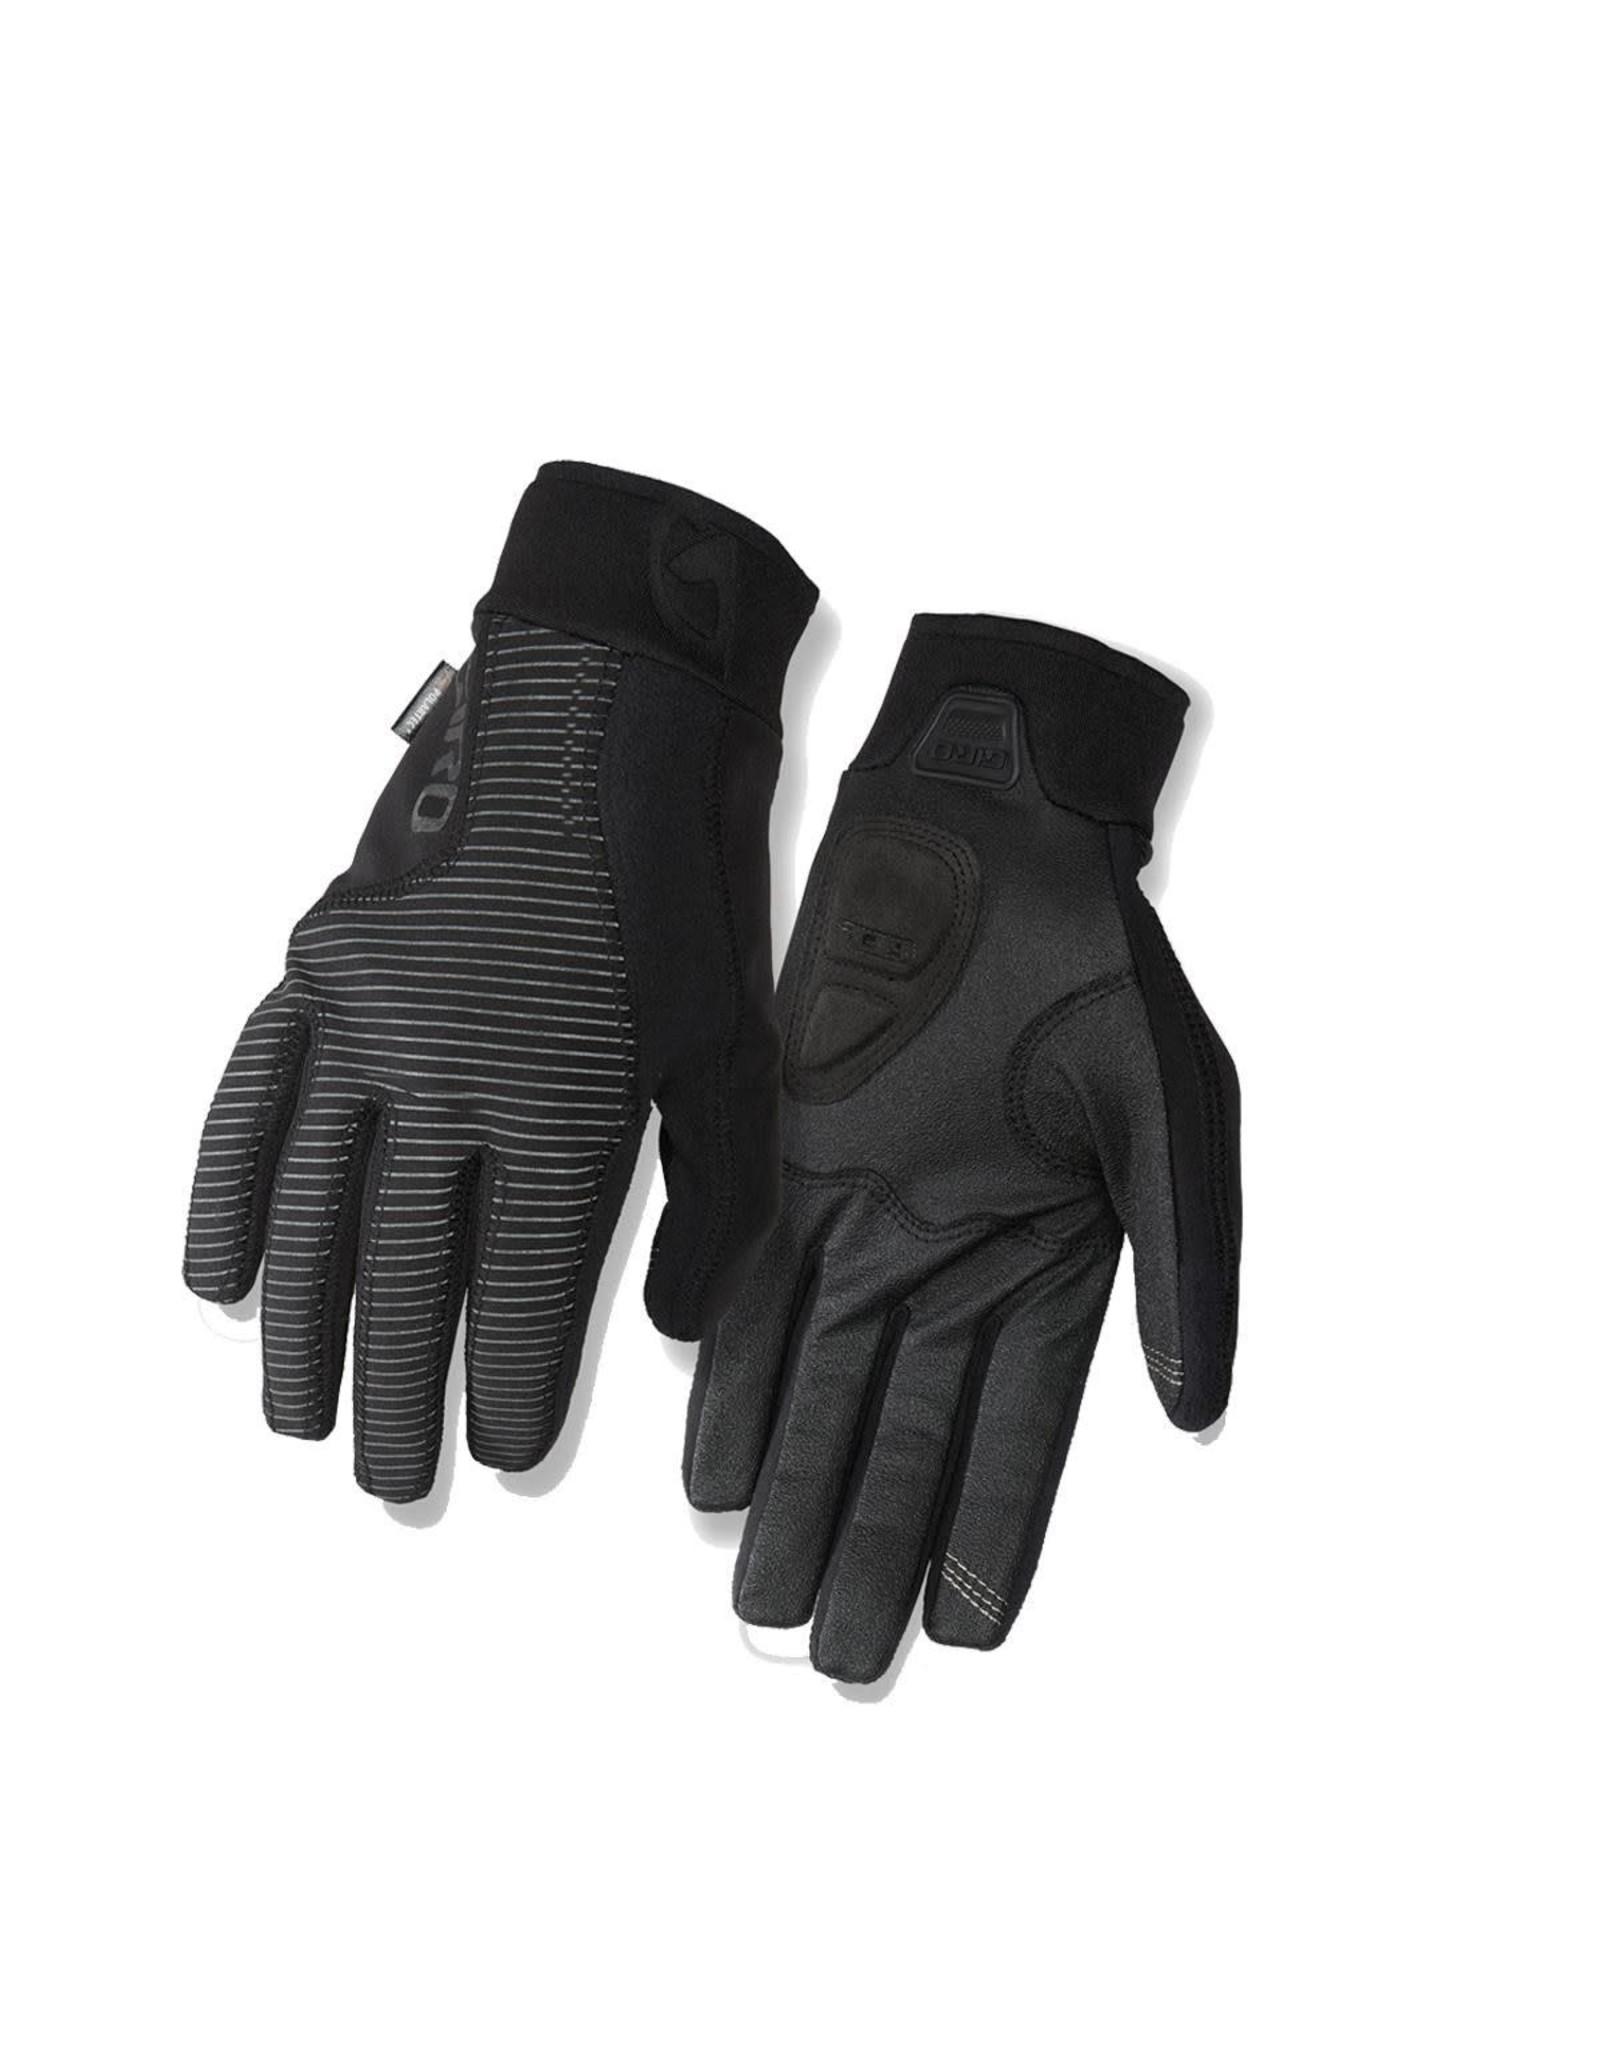 Giro Giro Blaze 2.0 Water Resistant Windbloc Cycling Glove - Extra Large